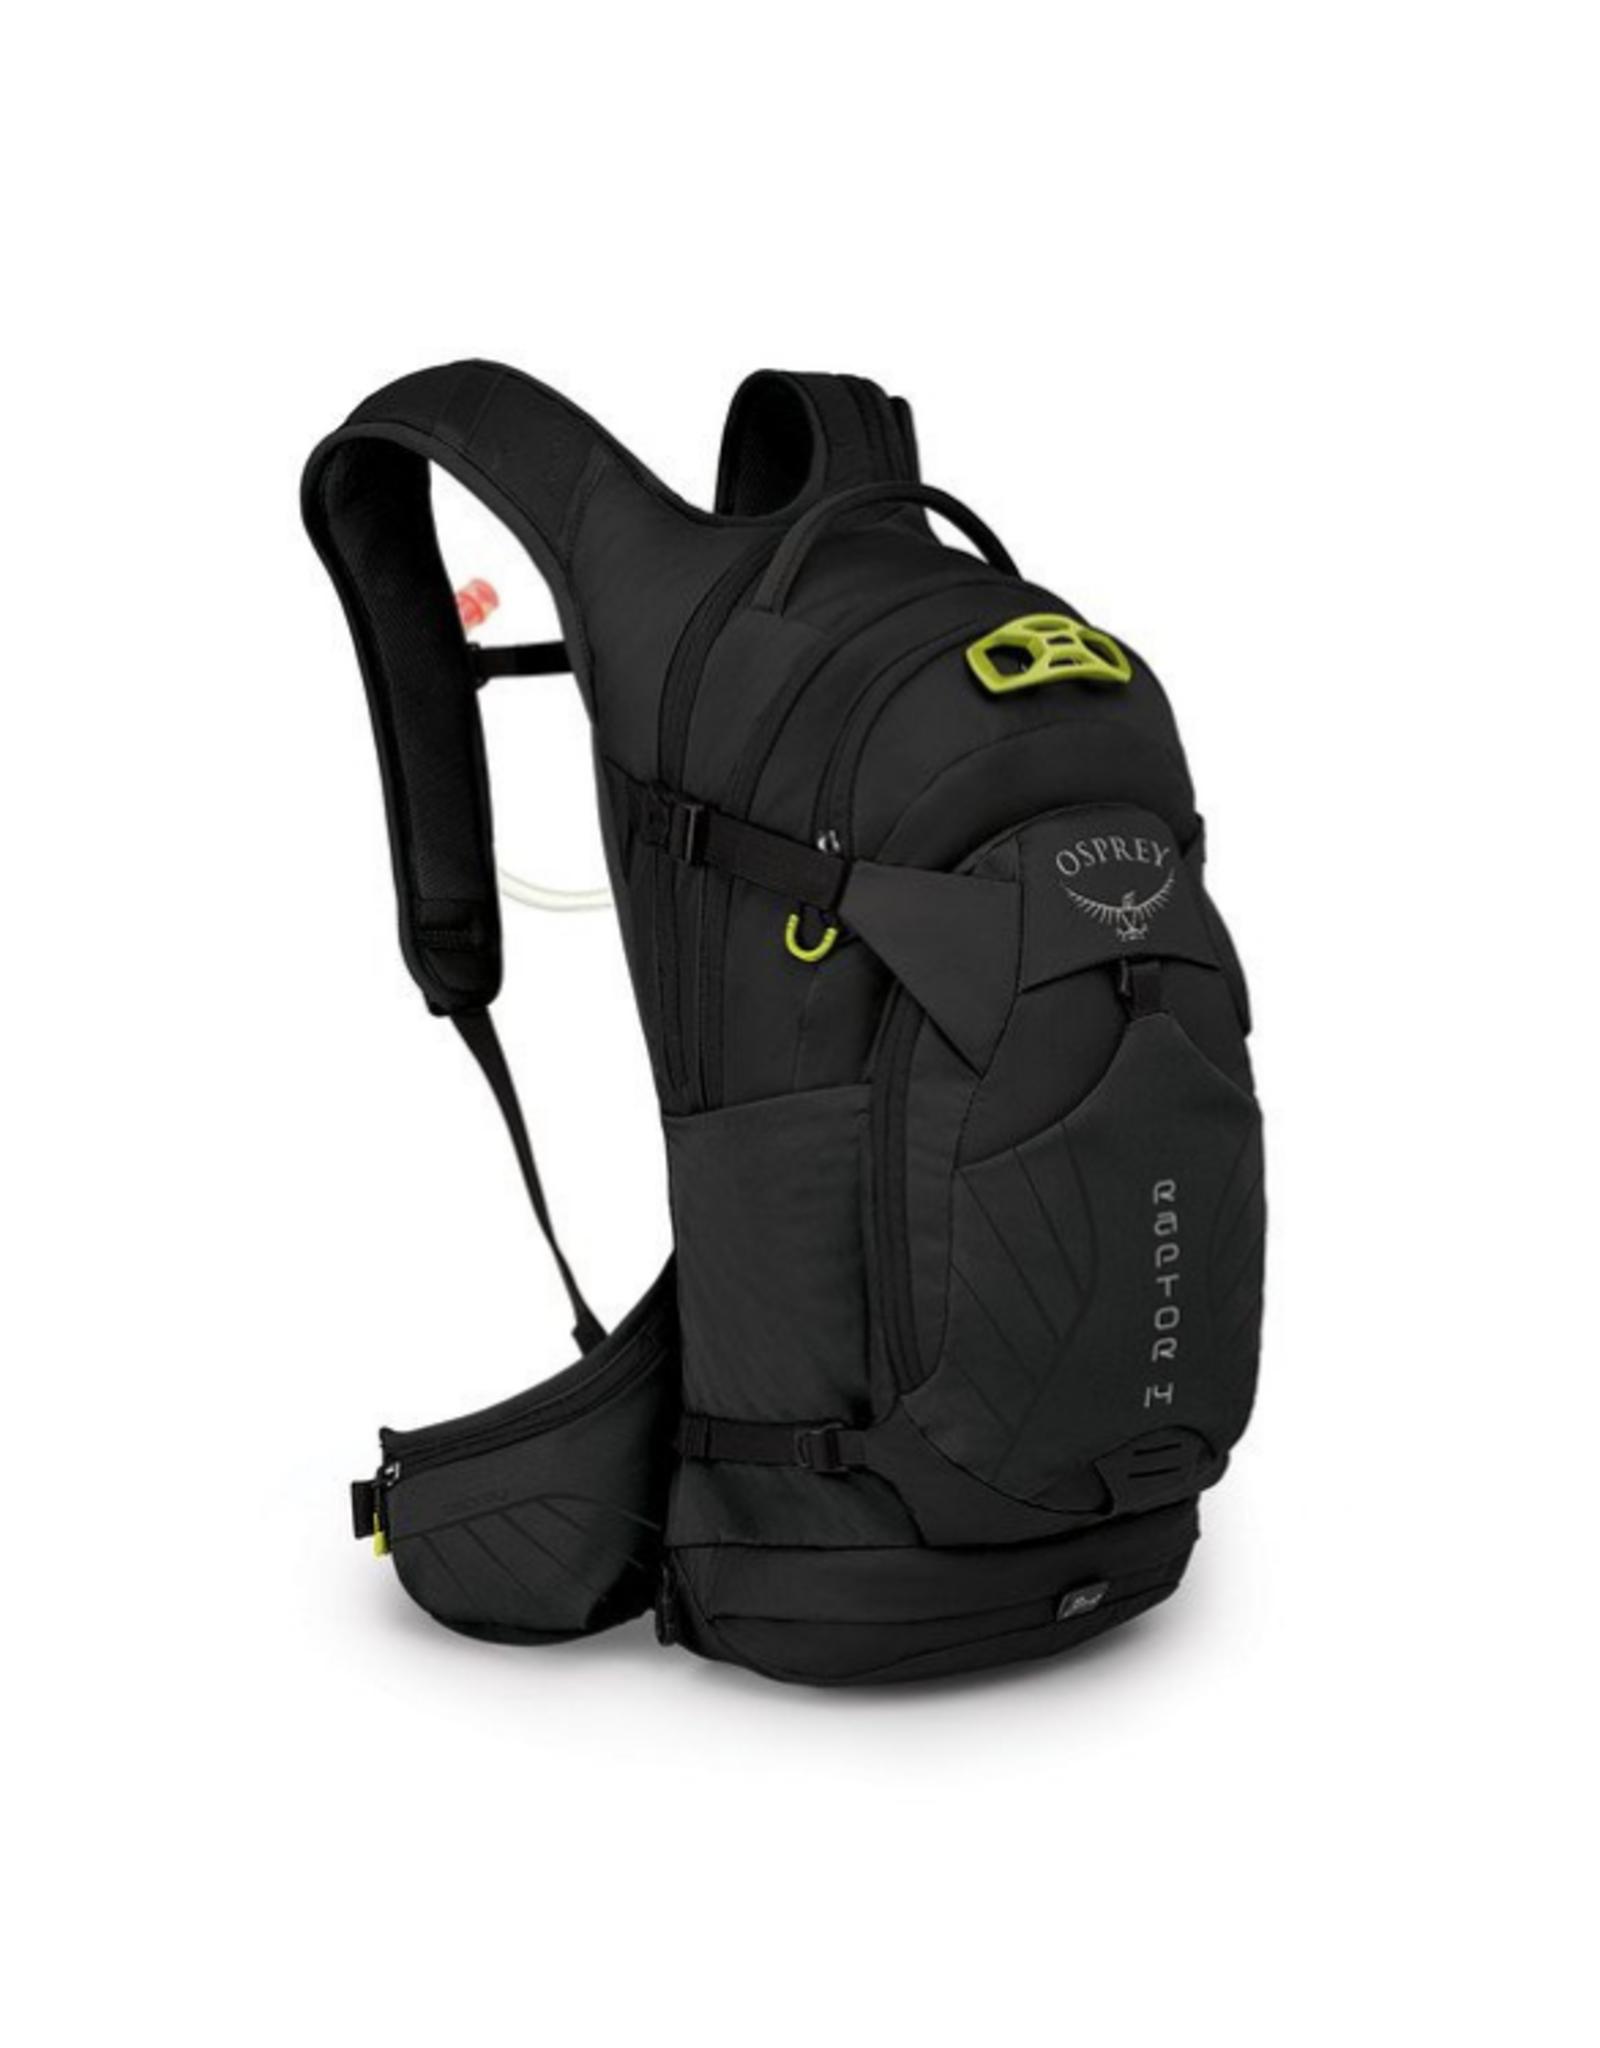 Osprey Osprey Raptor 14 Biking Pack w/Res